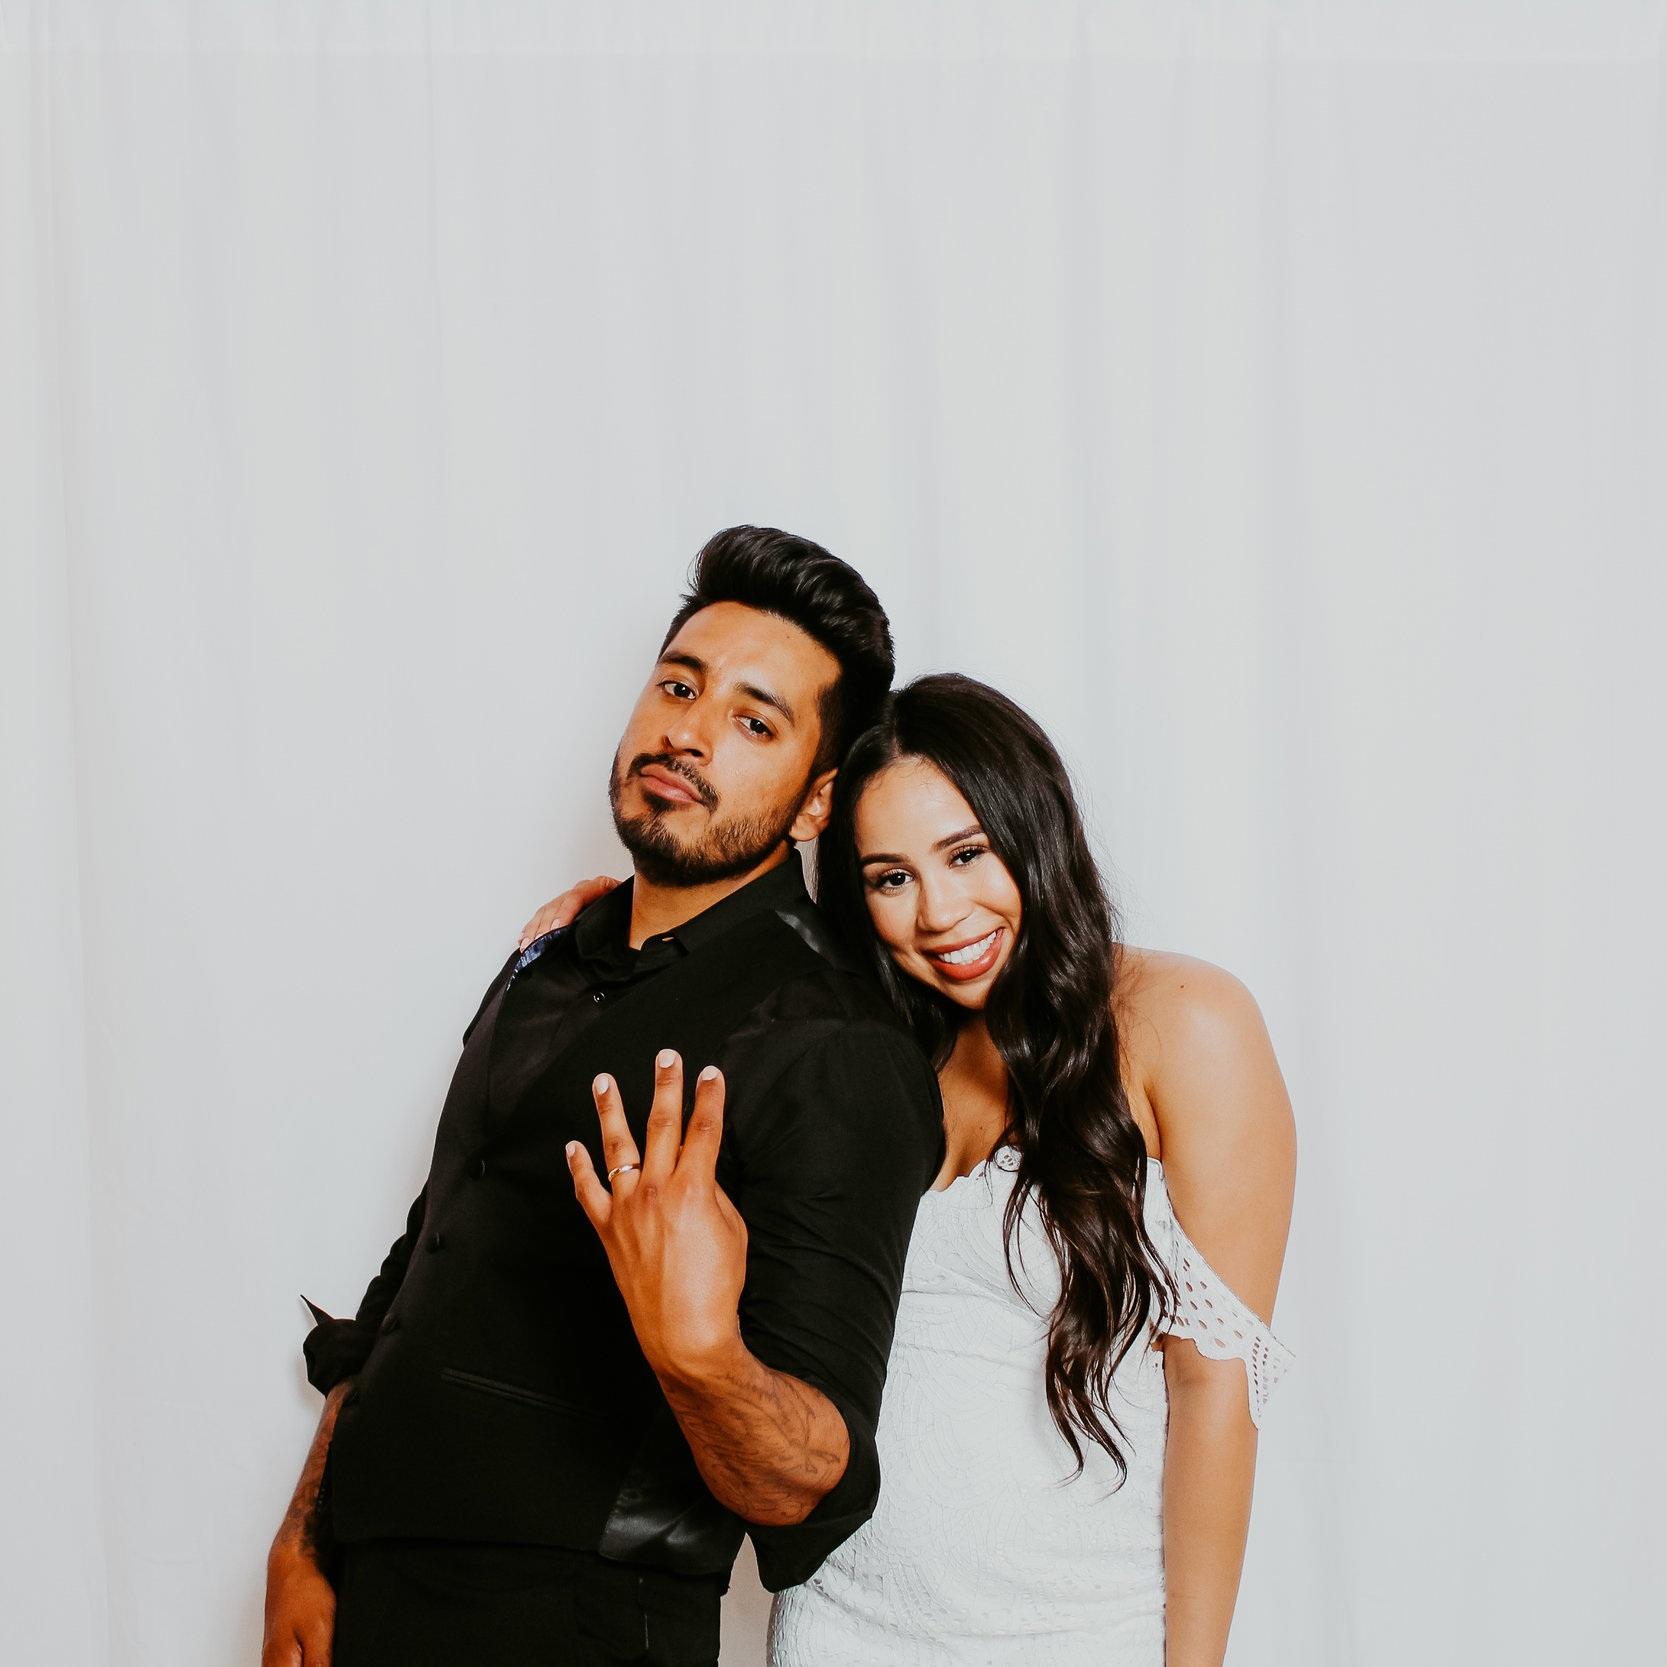 Los Angeles Wedding Photo Booth